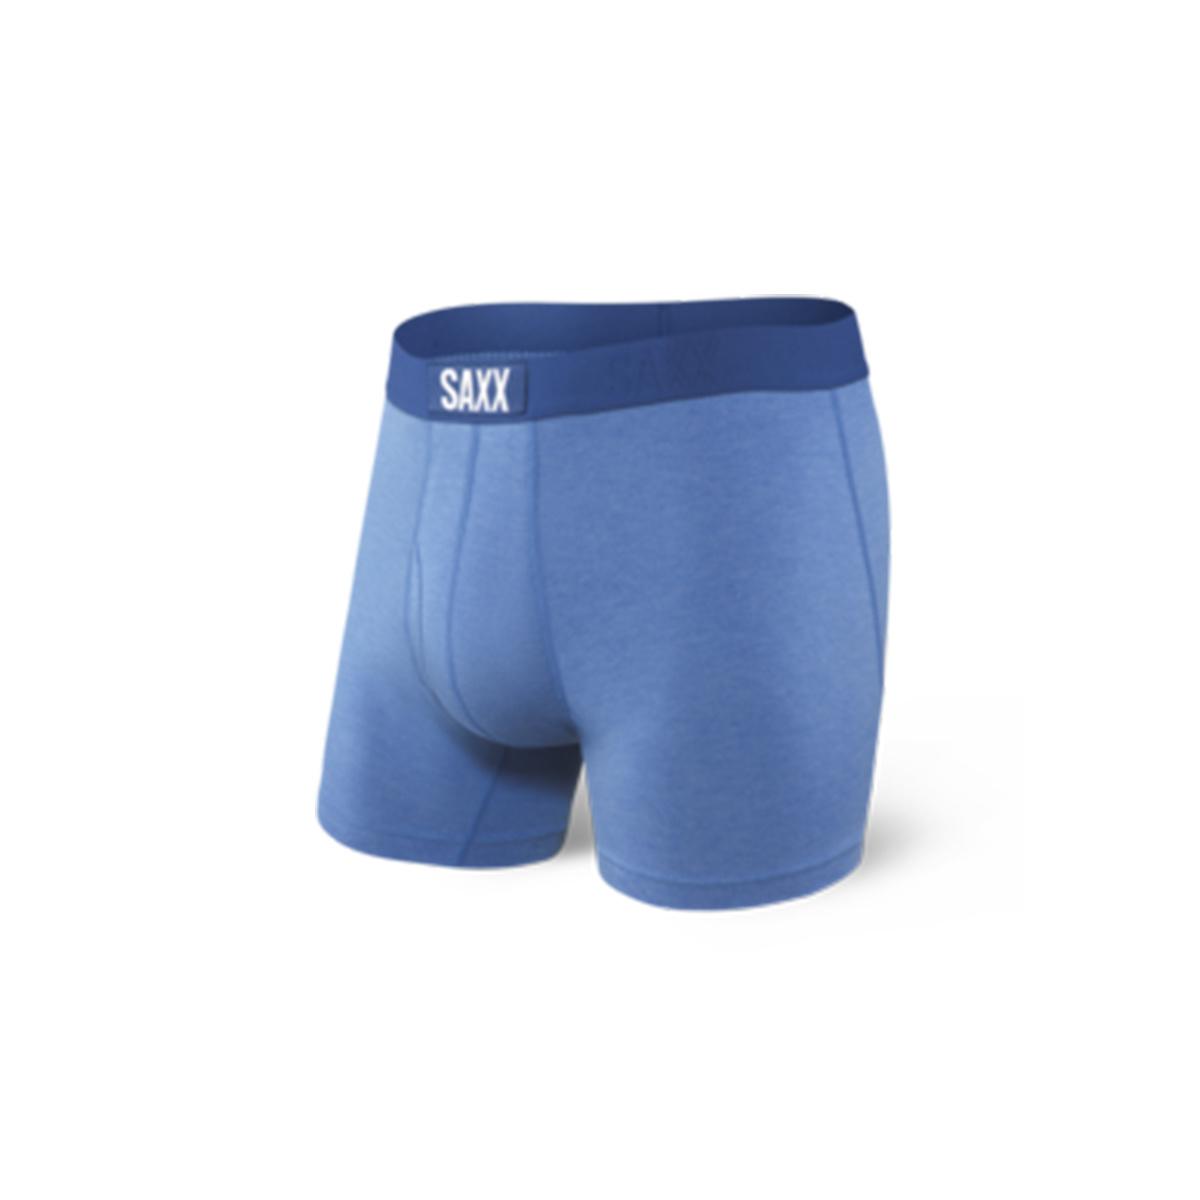 Saxx Underwear Co. Ultra Boxer Fly